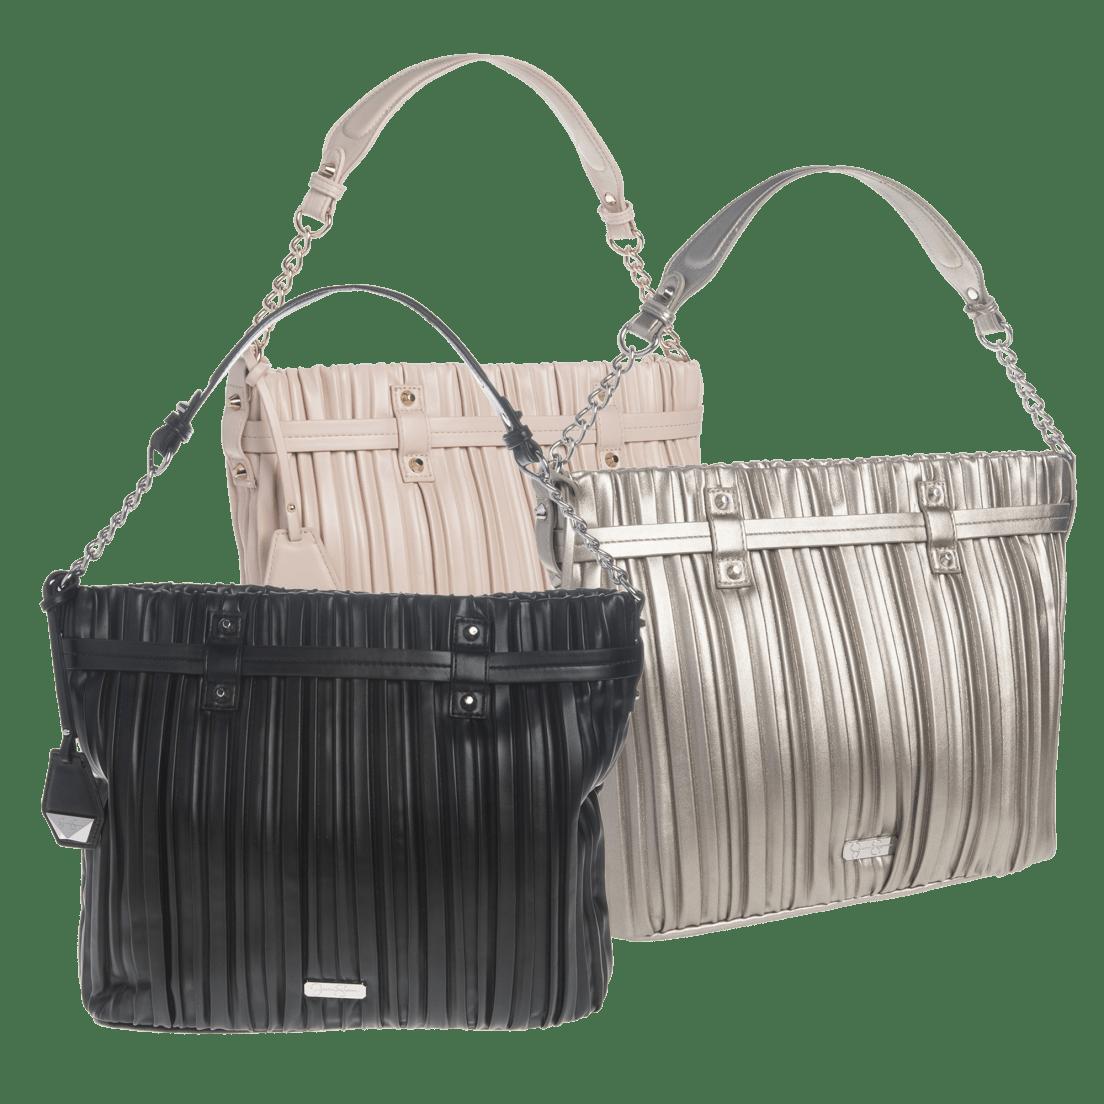 Jessica Simpson Becca Hobo Handbags bc4d341838aeb